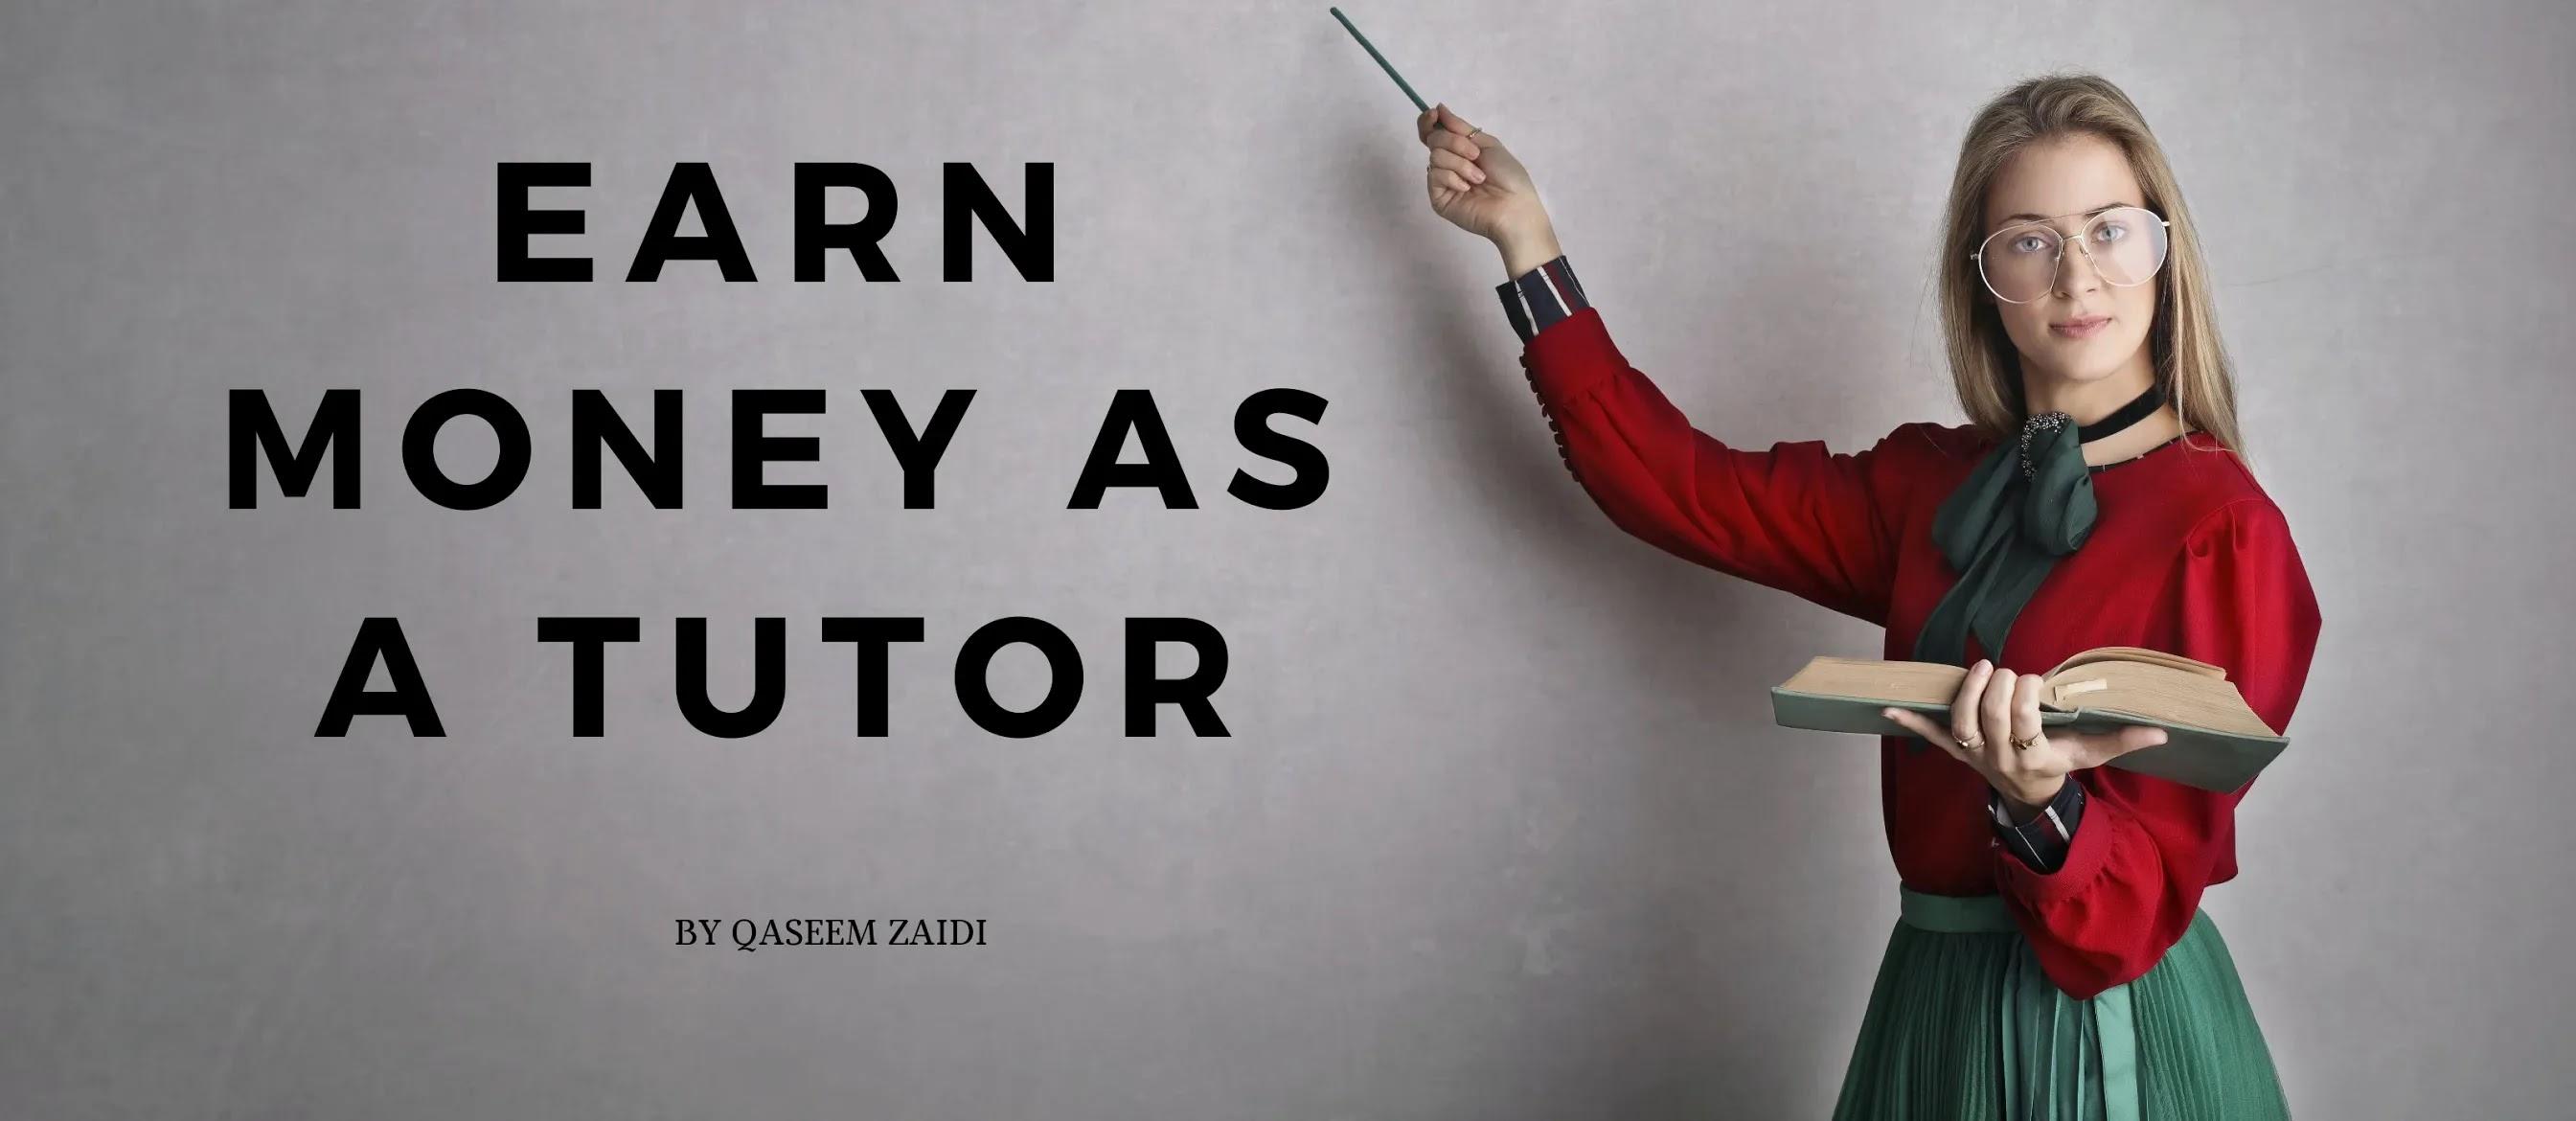 How To Make Money As A Teacher: Teach Online And Earn Money